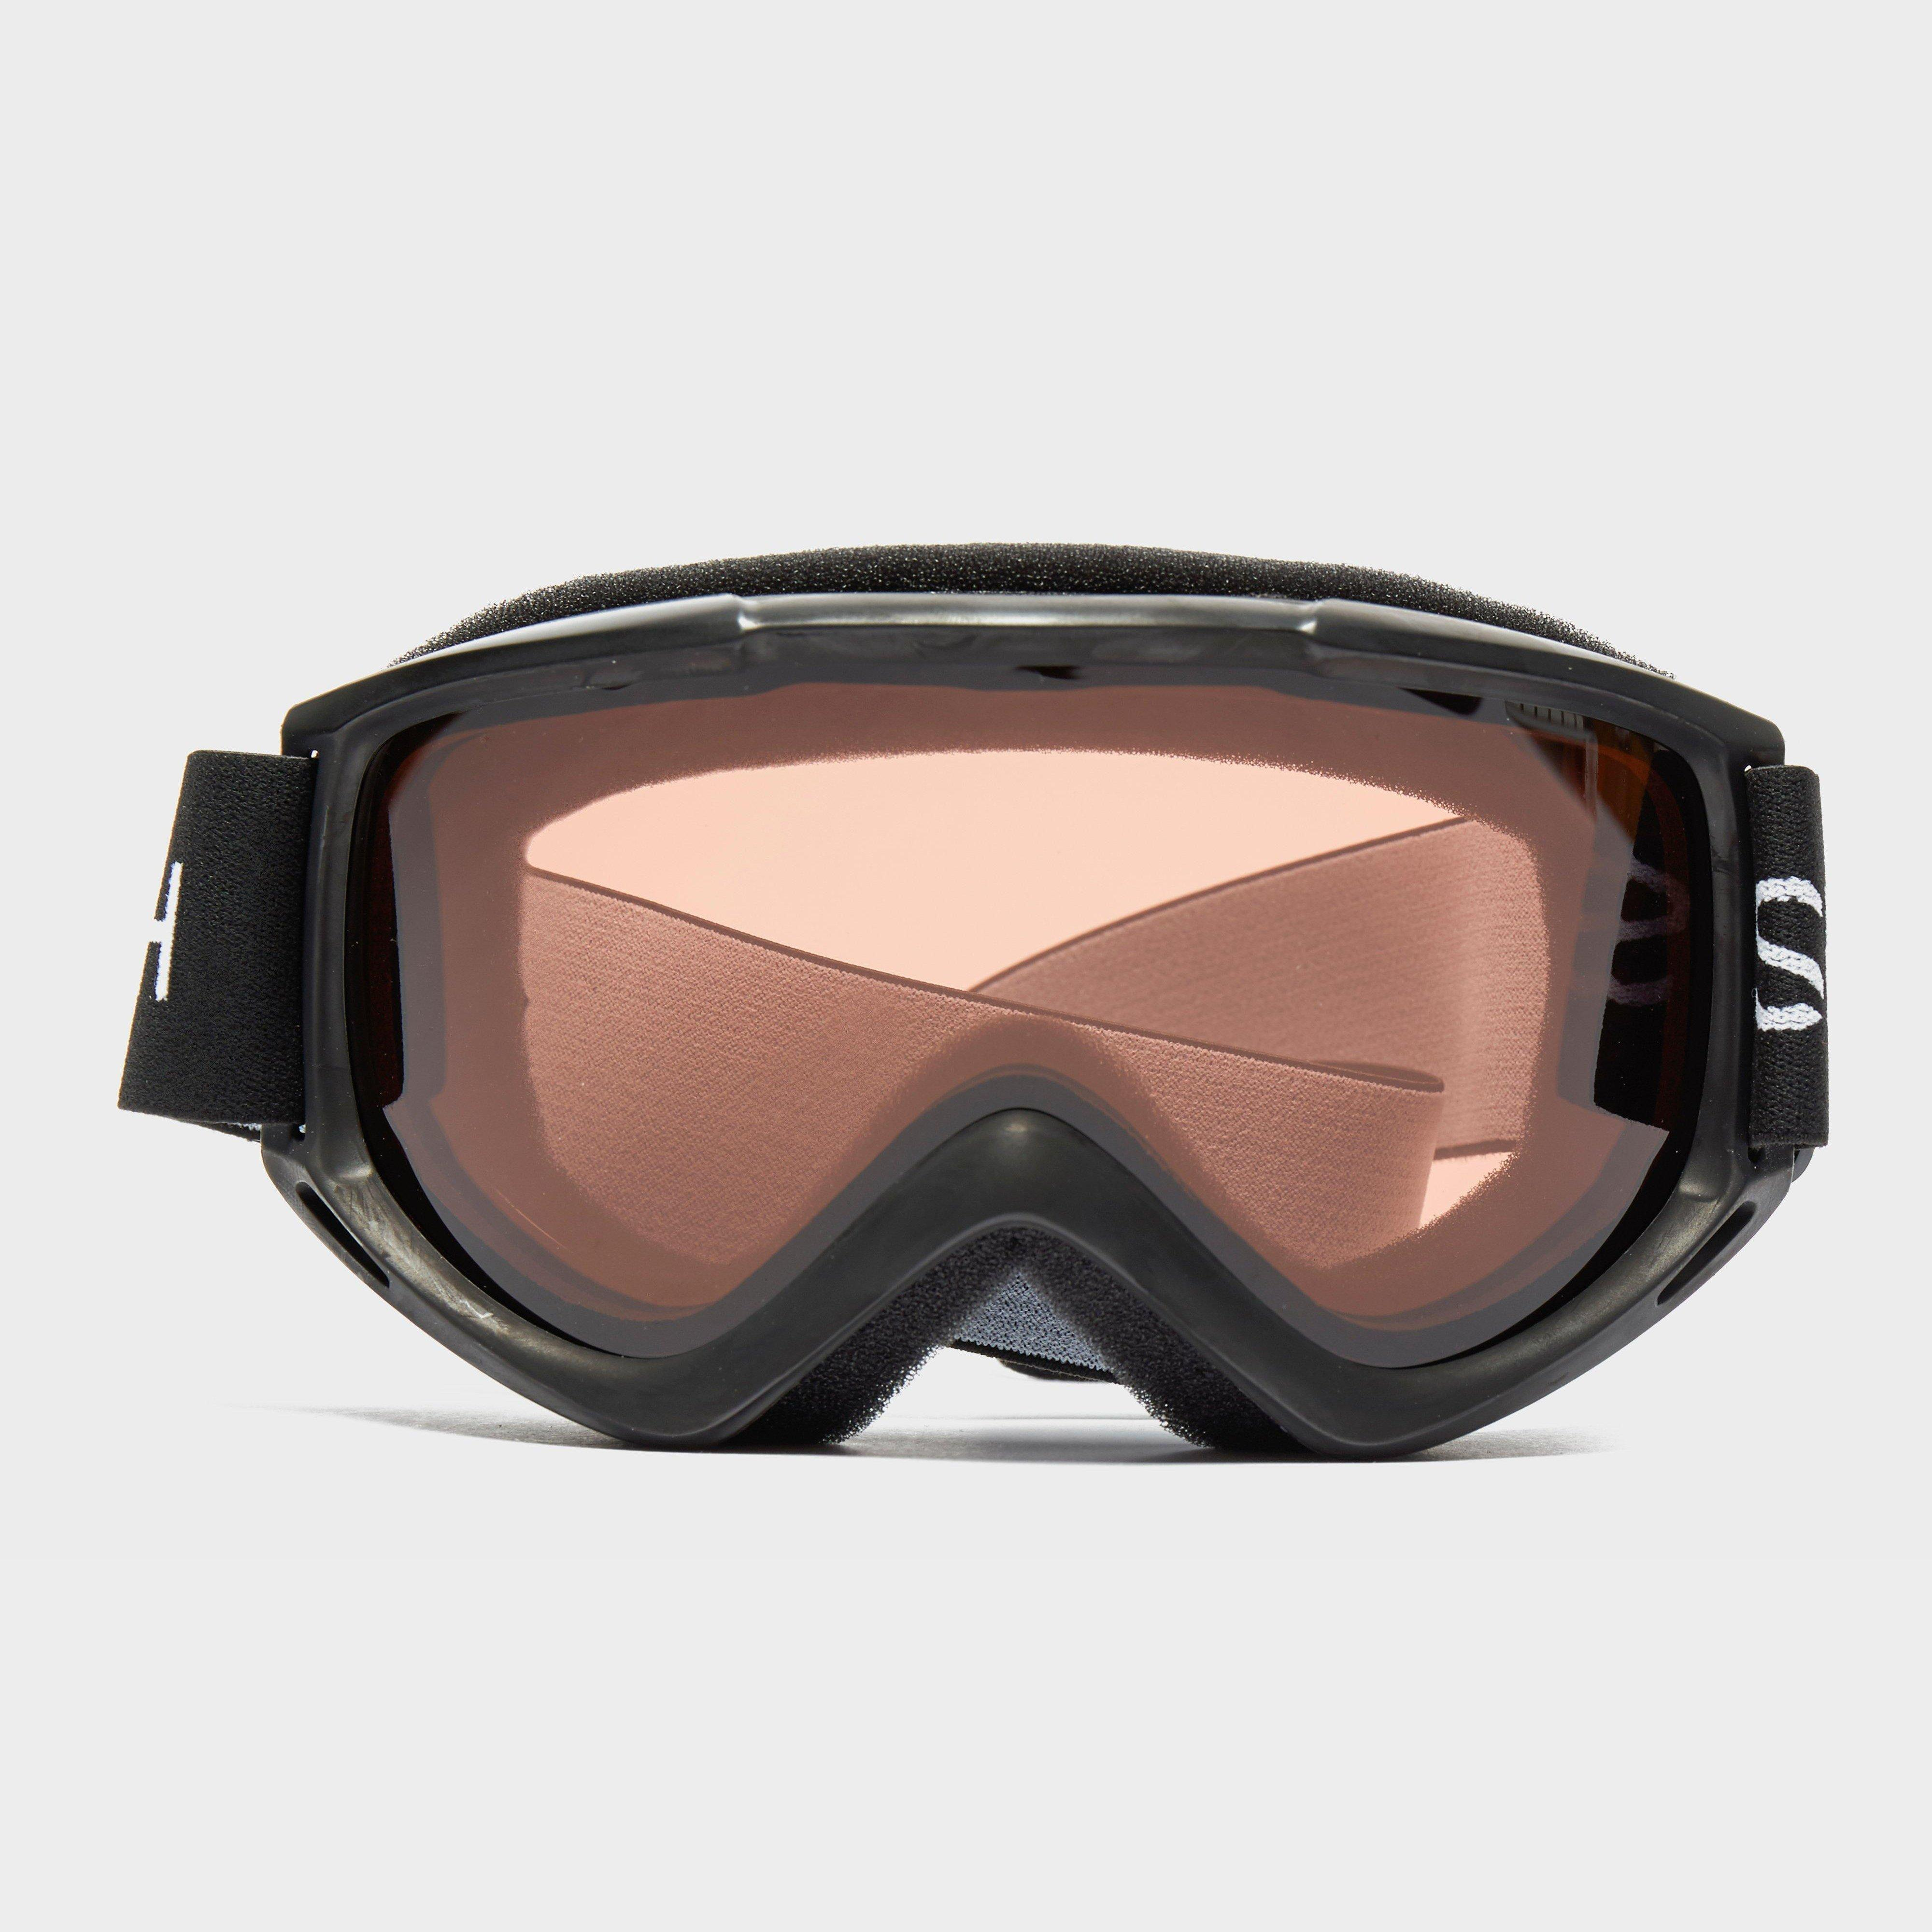 Smith Smith Mens Cascade Classic Ski Goggles - Black, Black